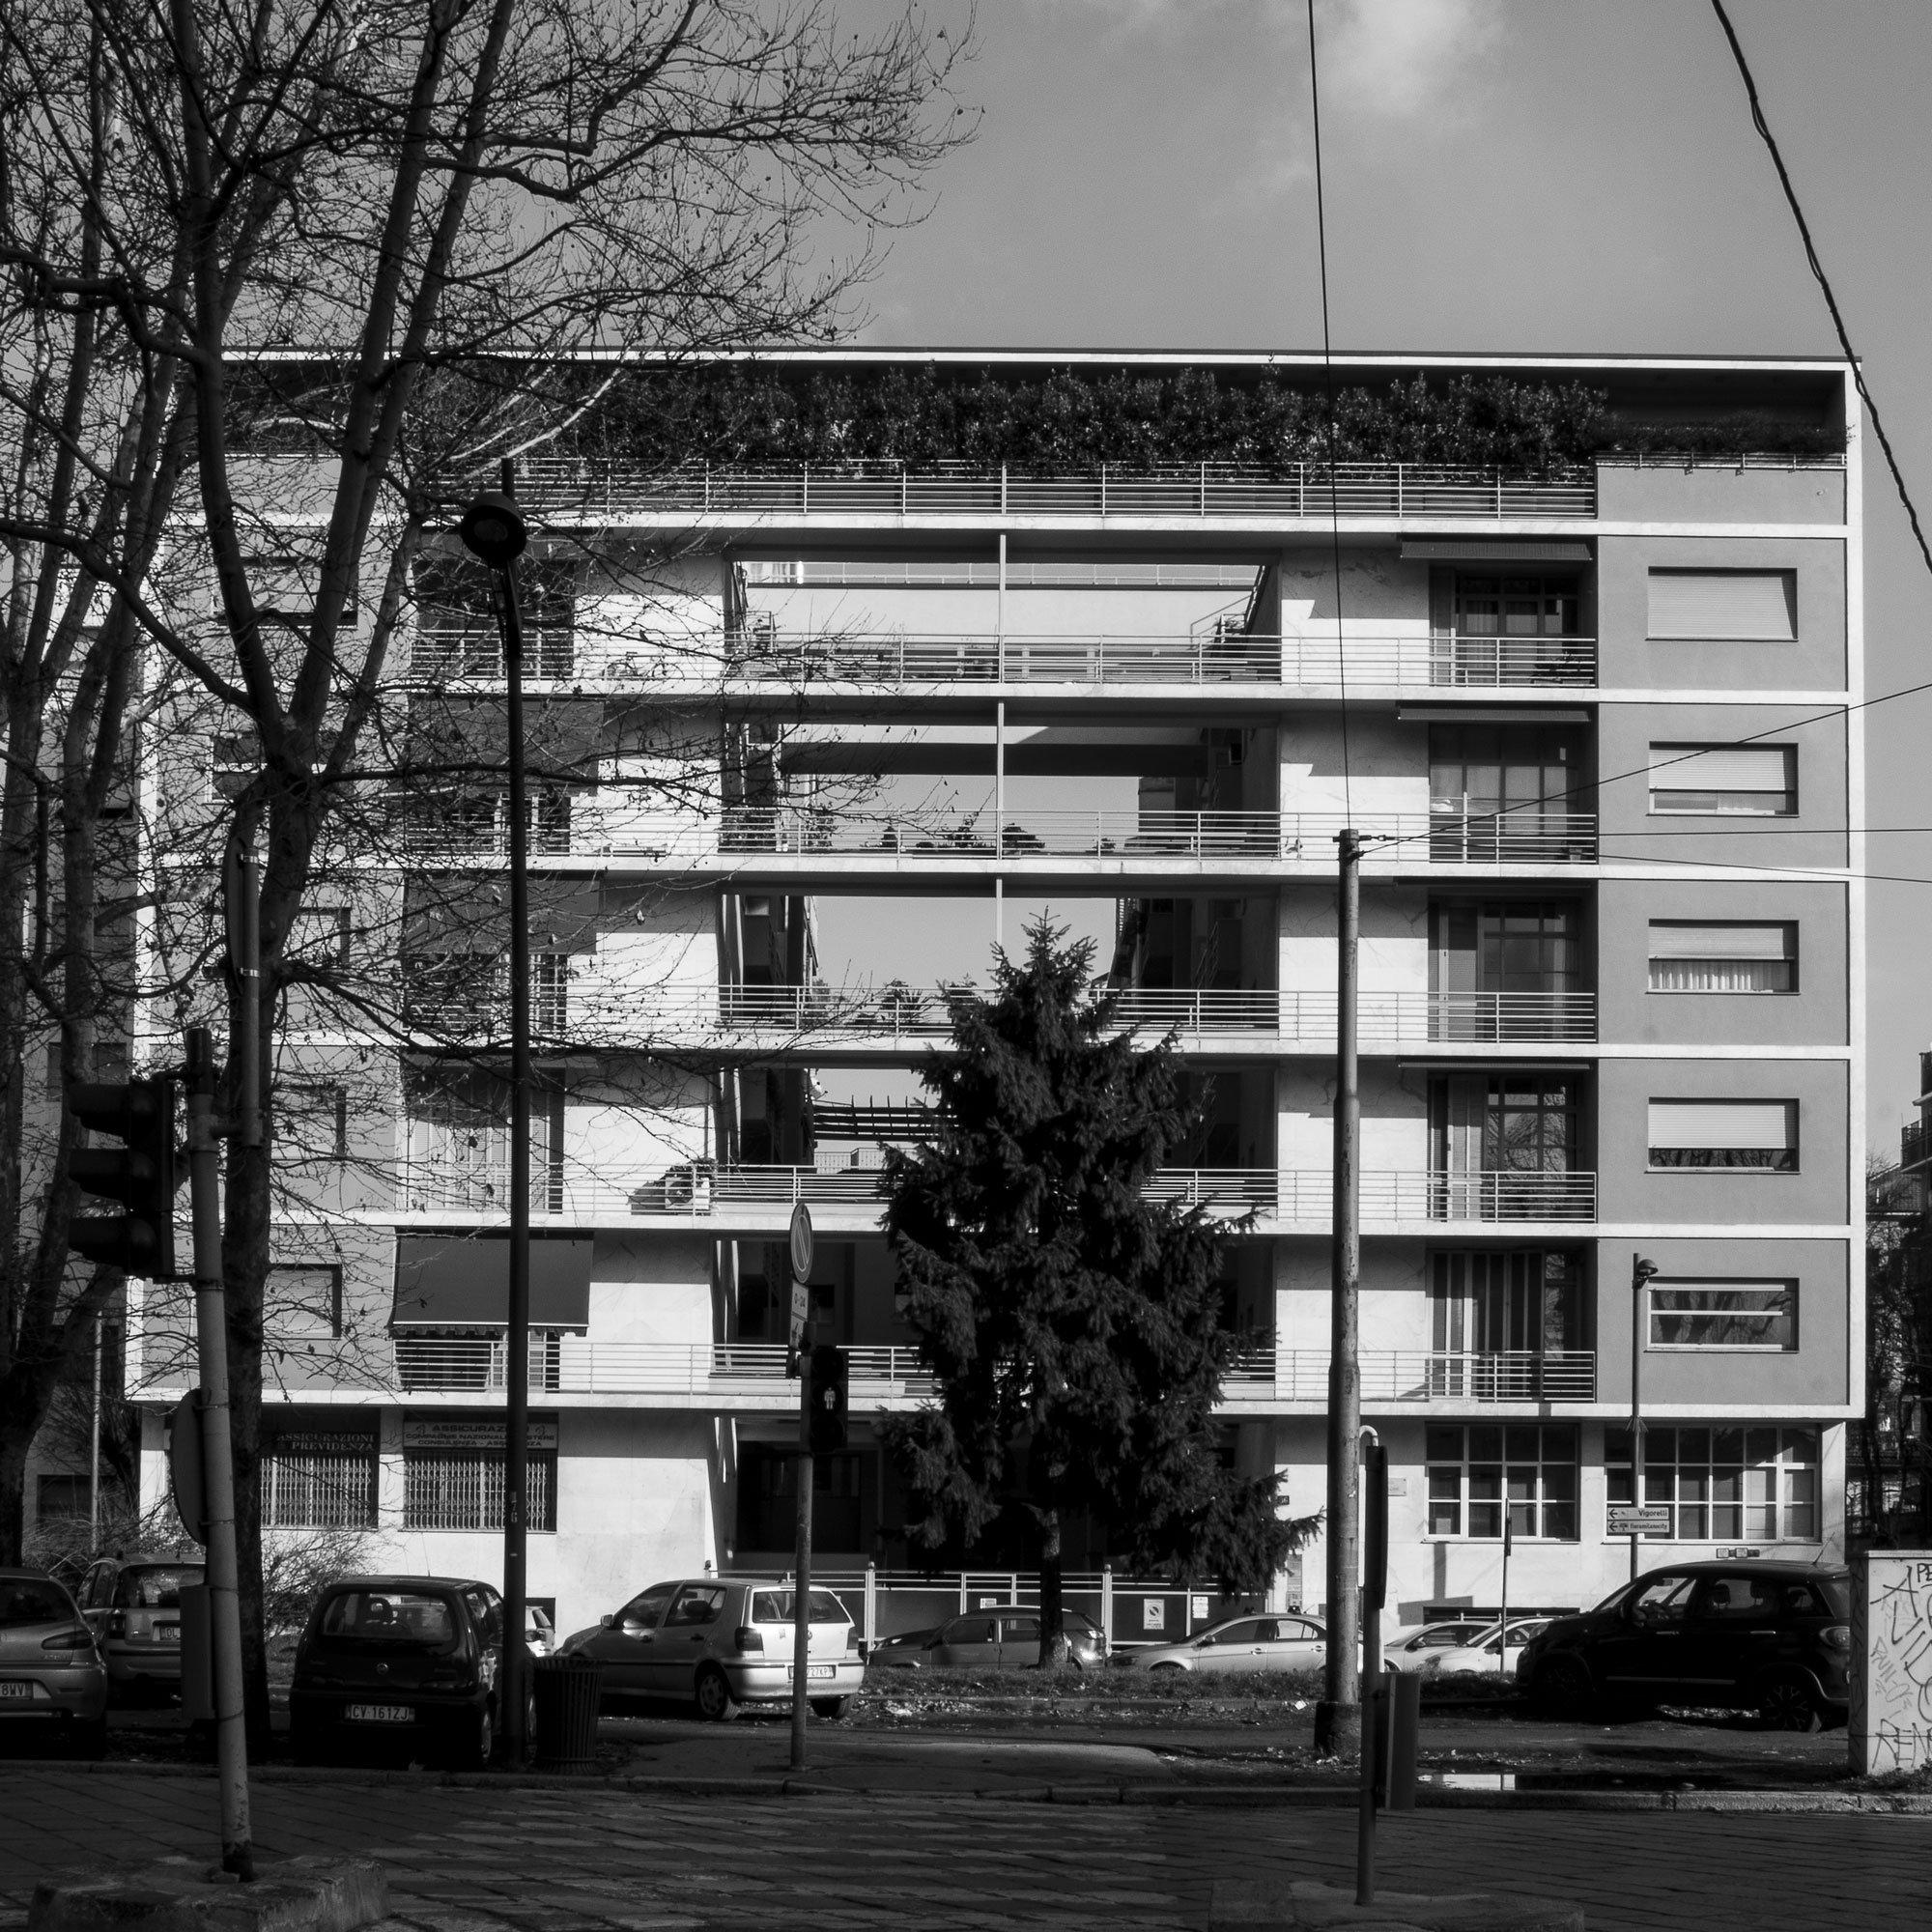 Giuseppe Terragni, Pietro Lingeri, Casa Rustici, Milano (1933-1936) © Maurizio Petronio